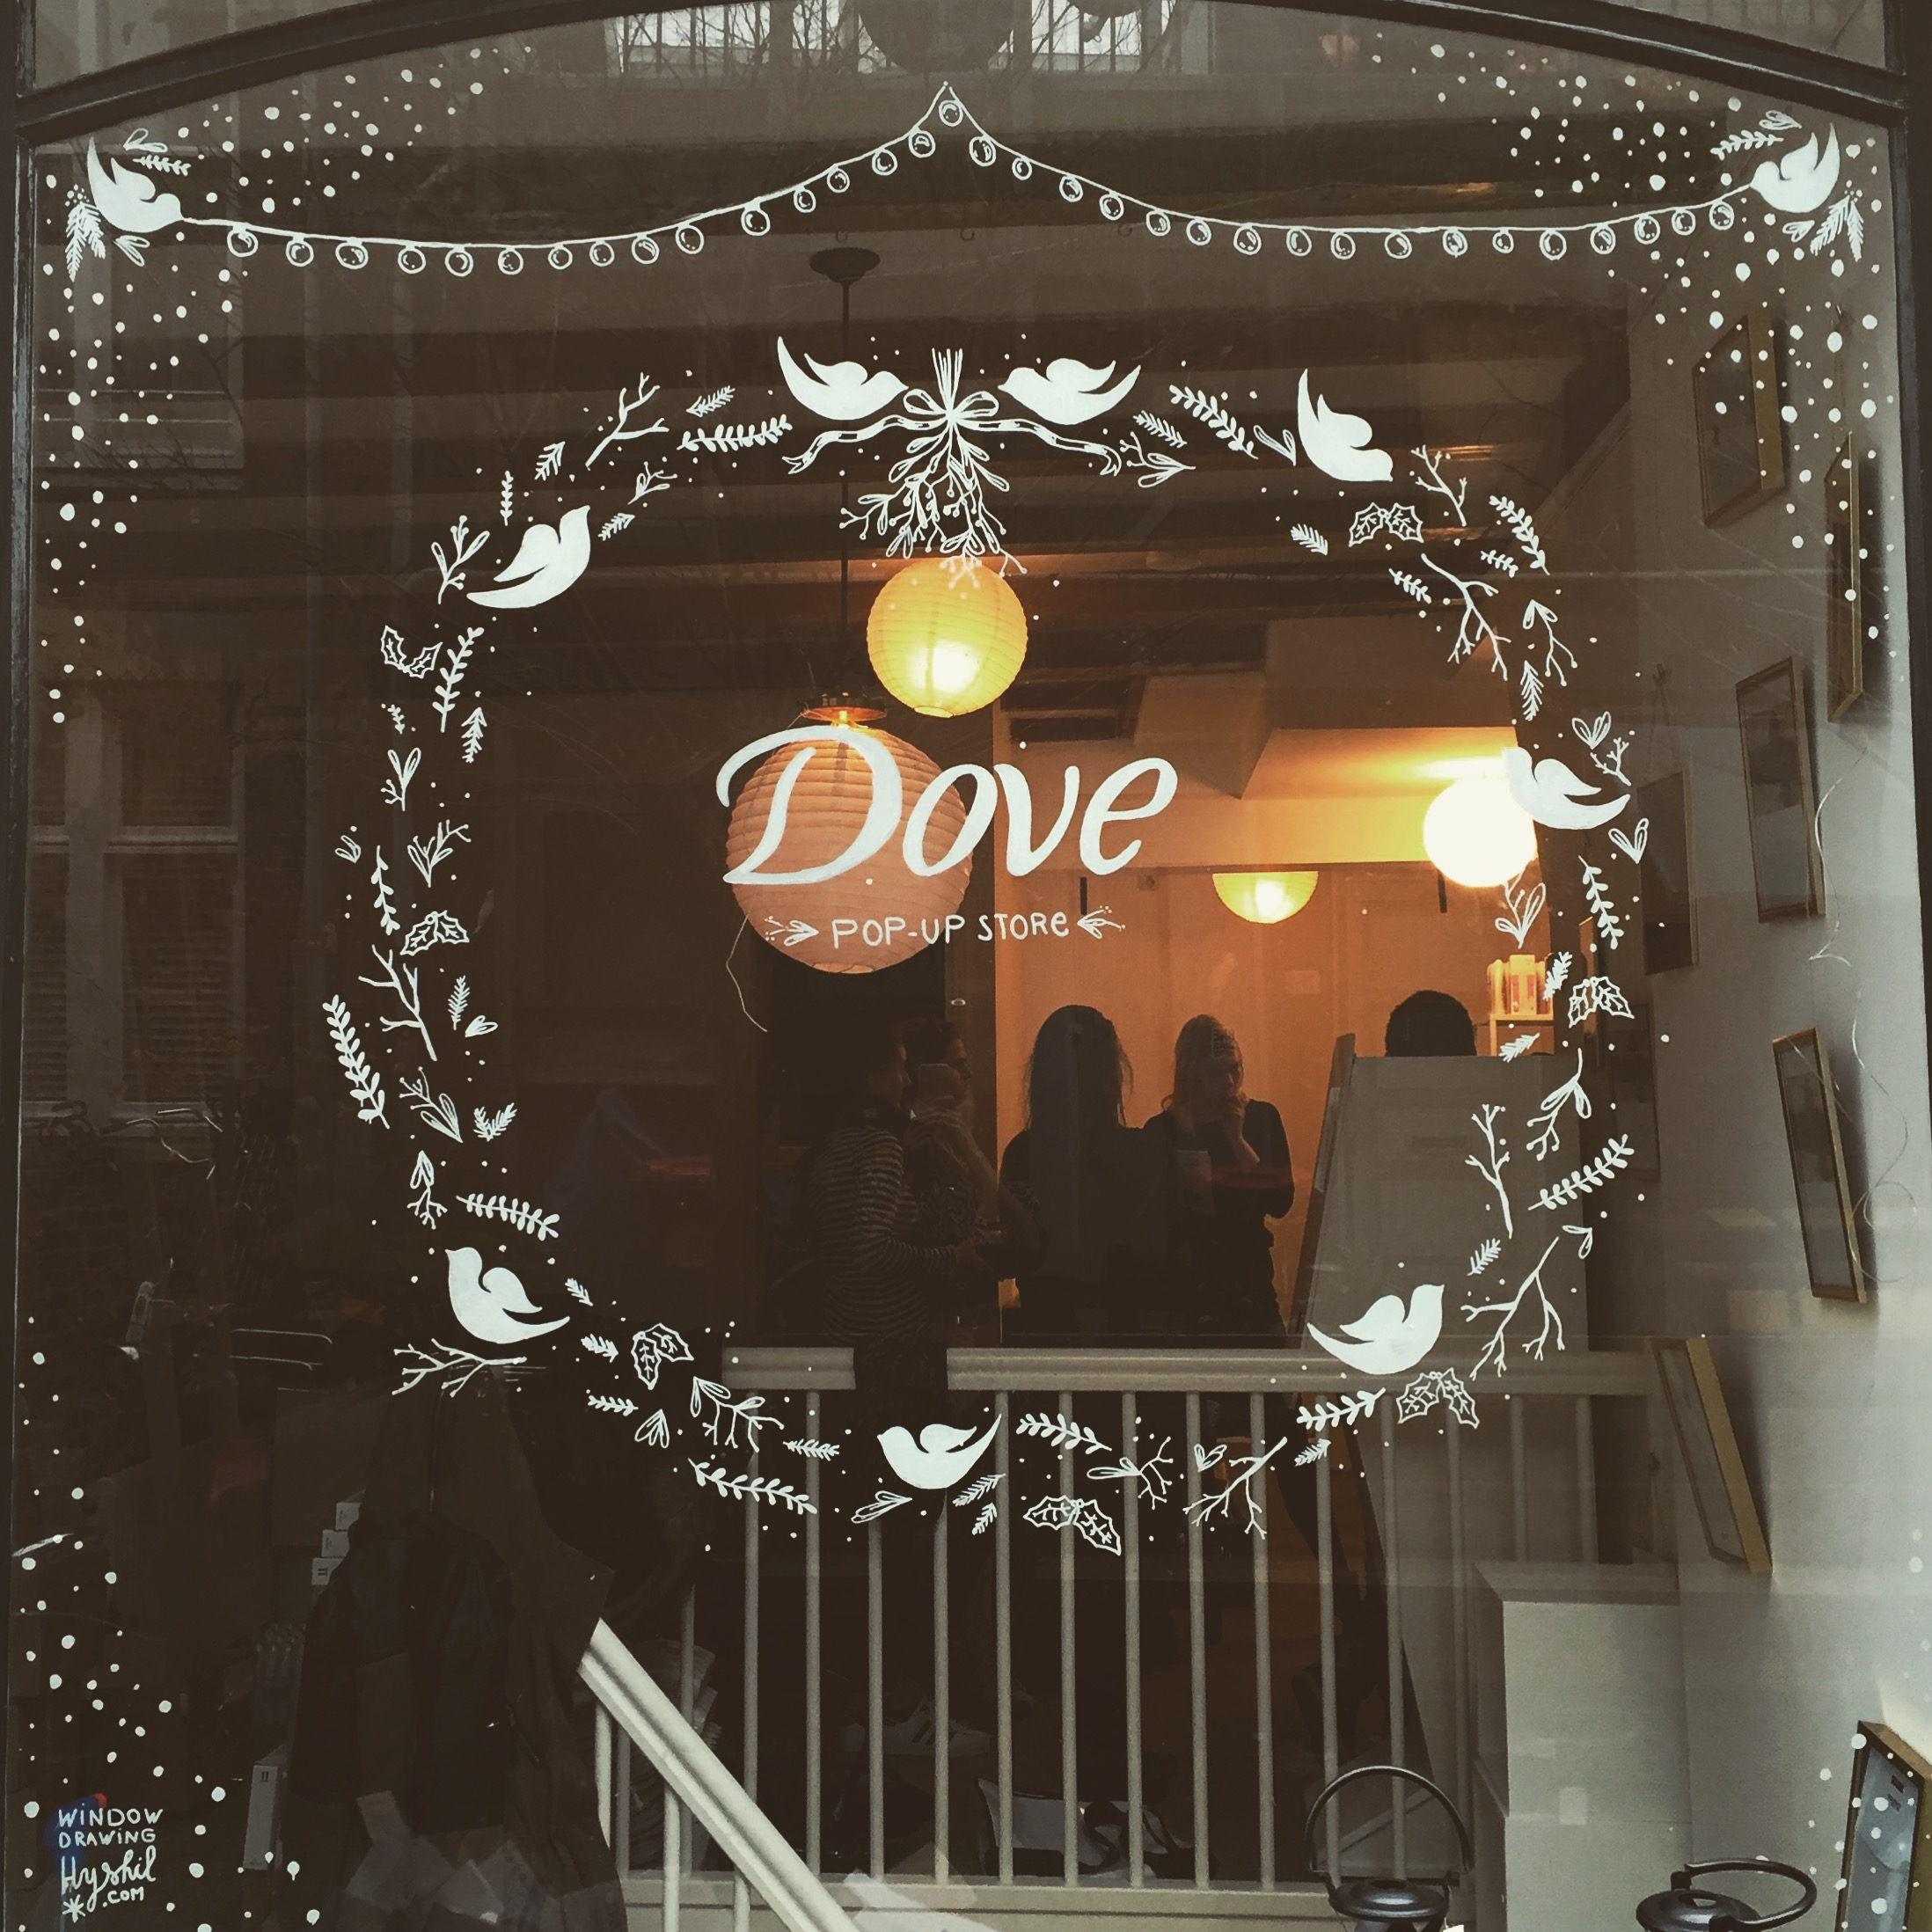 Dove pop-up store. Utrechtse Dwarsstraat 67.